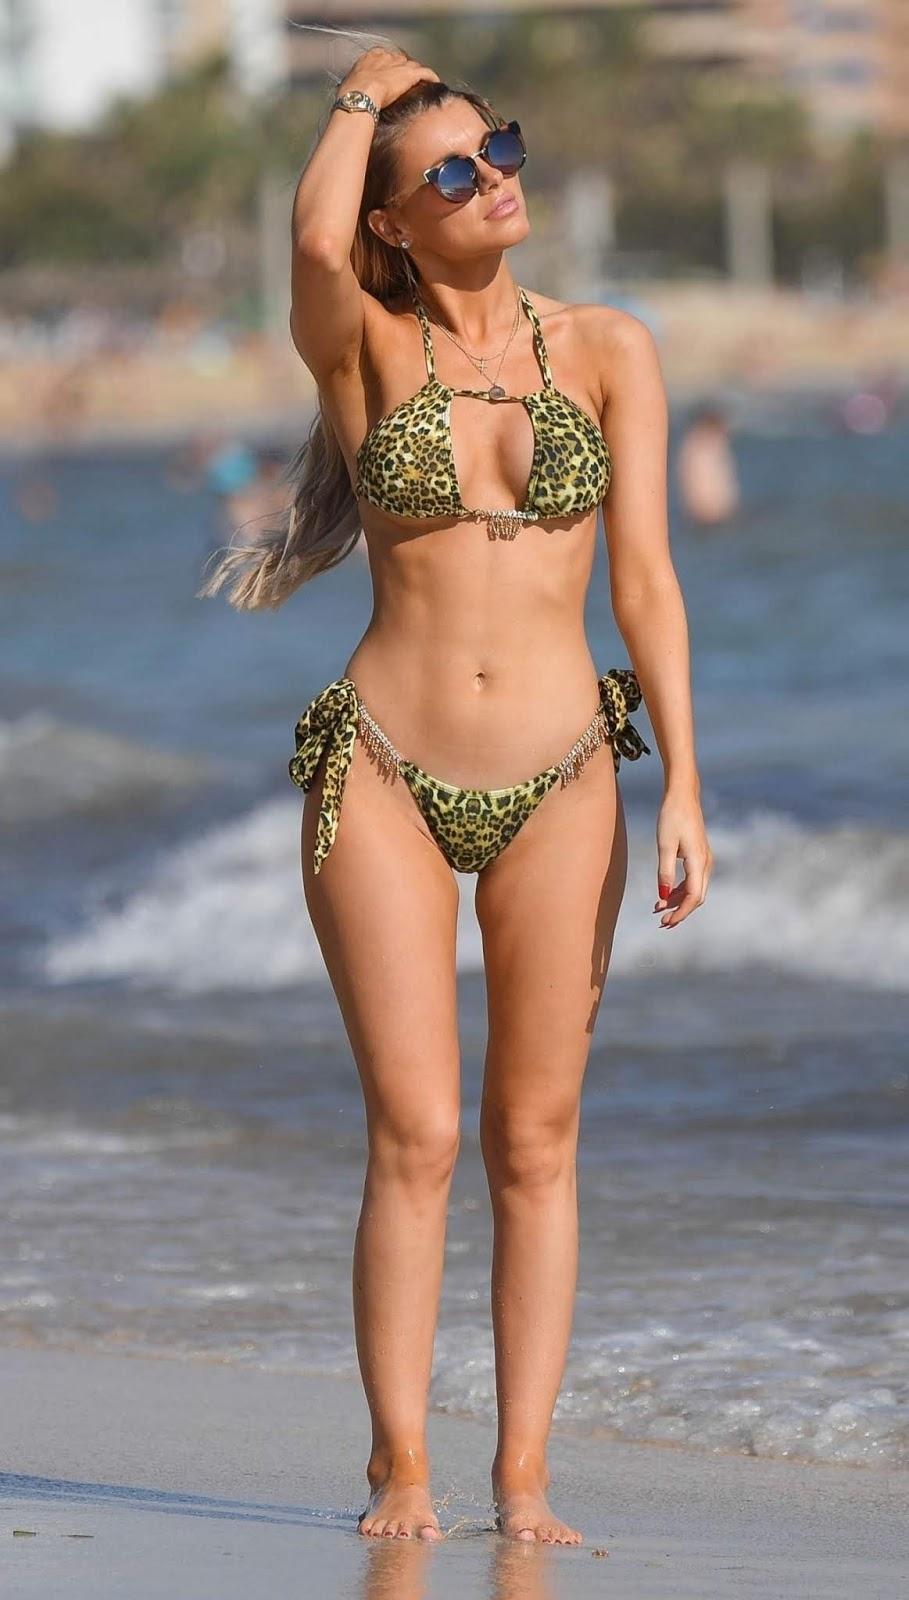 Hayley Hughes in a Bikini 11/20/2018